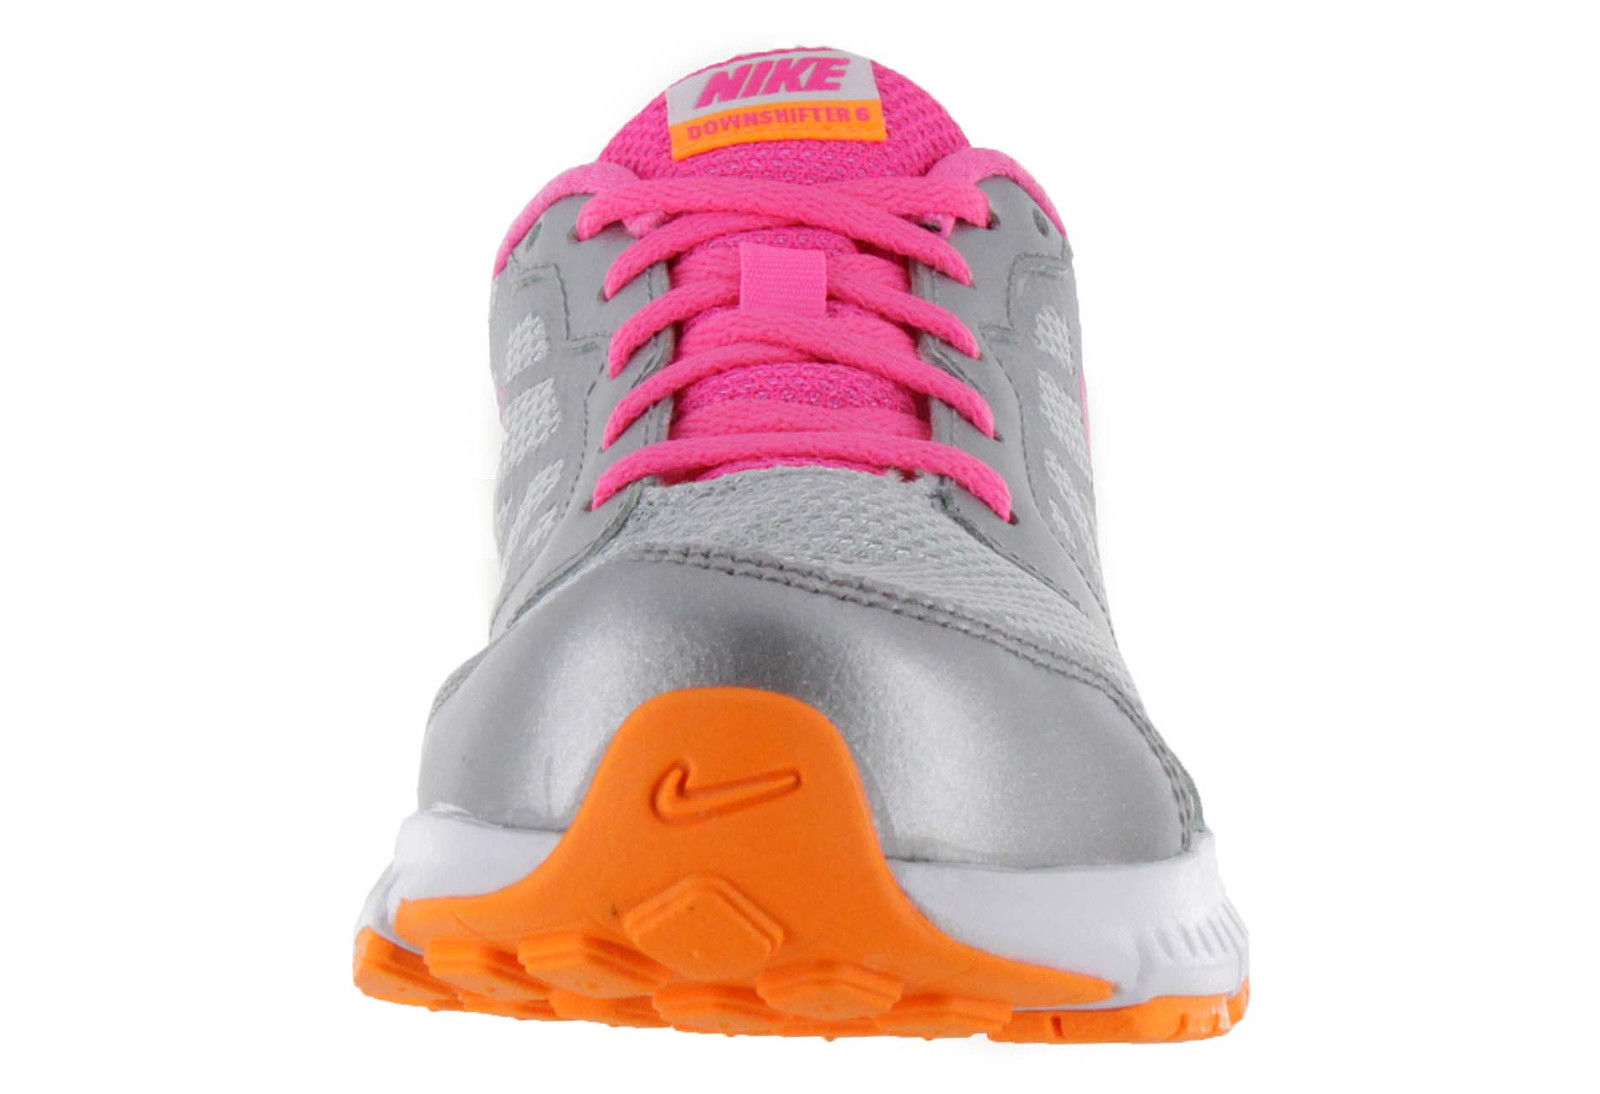 Nike G Downshifter 6 Athletics Platinum/Bright Citrus/Silver/Pink Pow